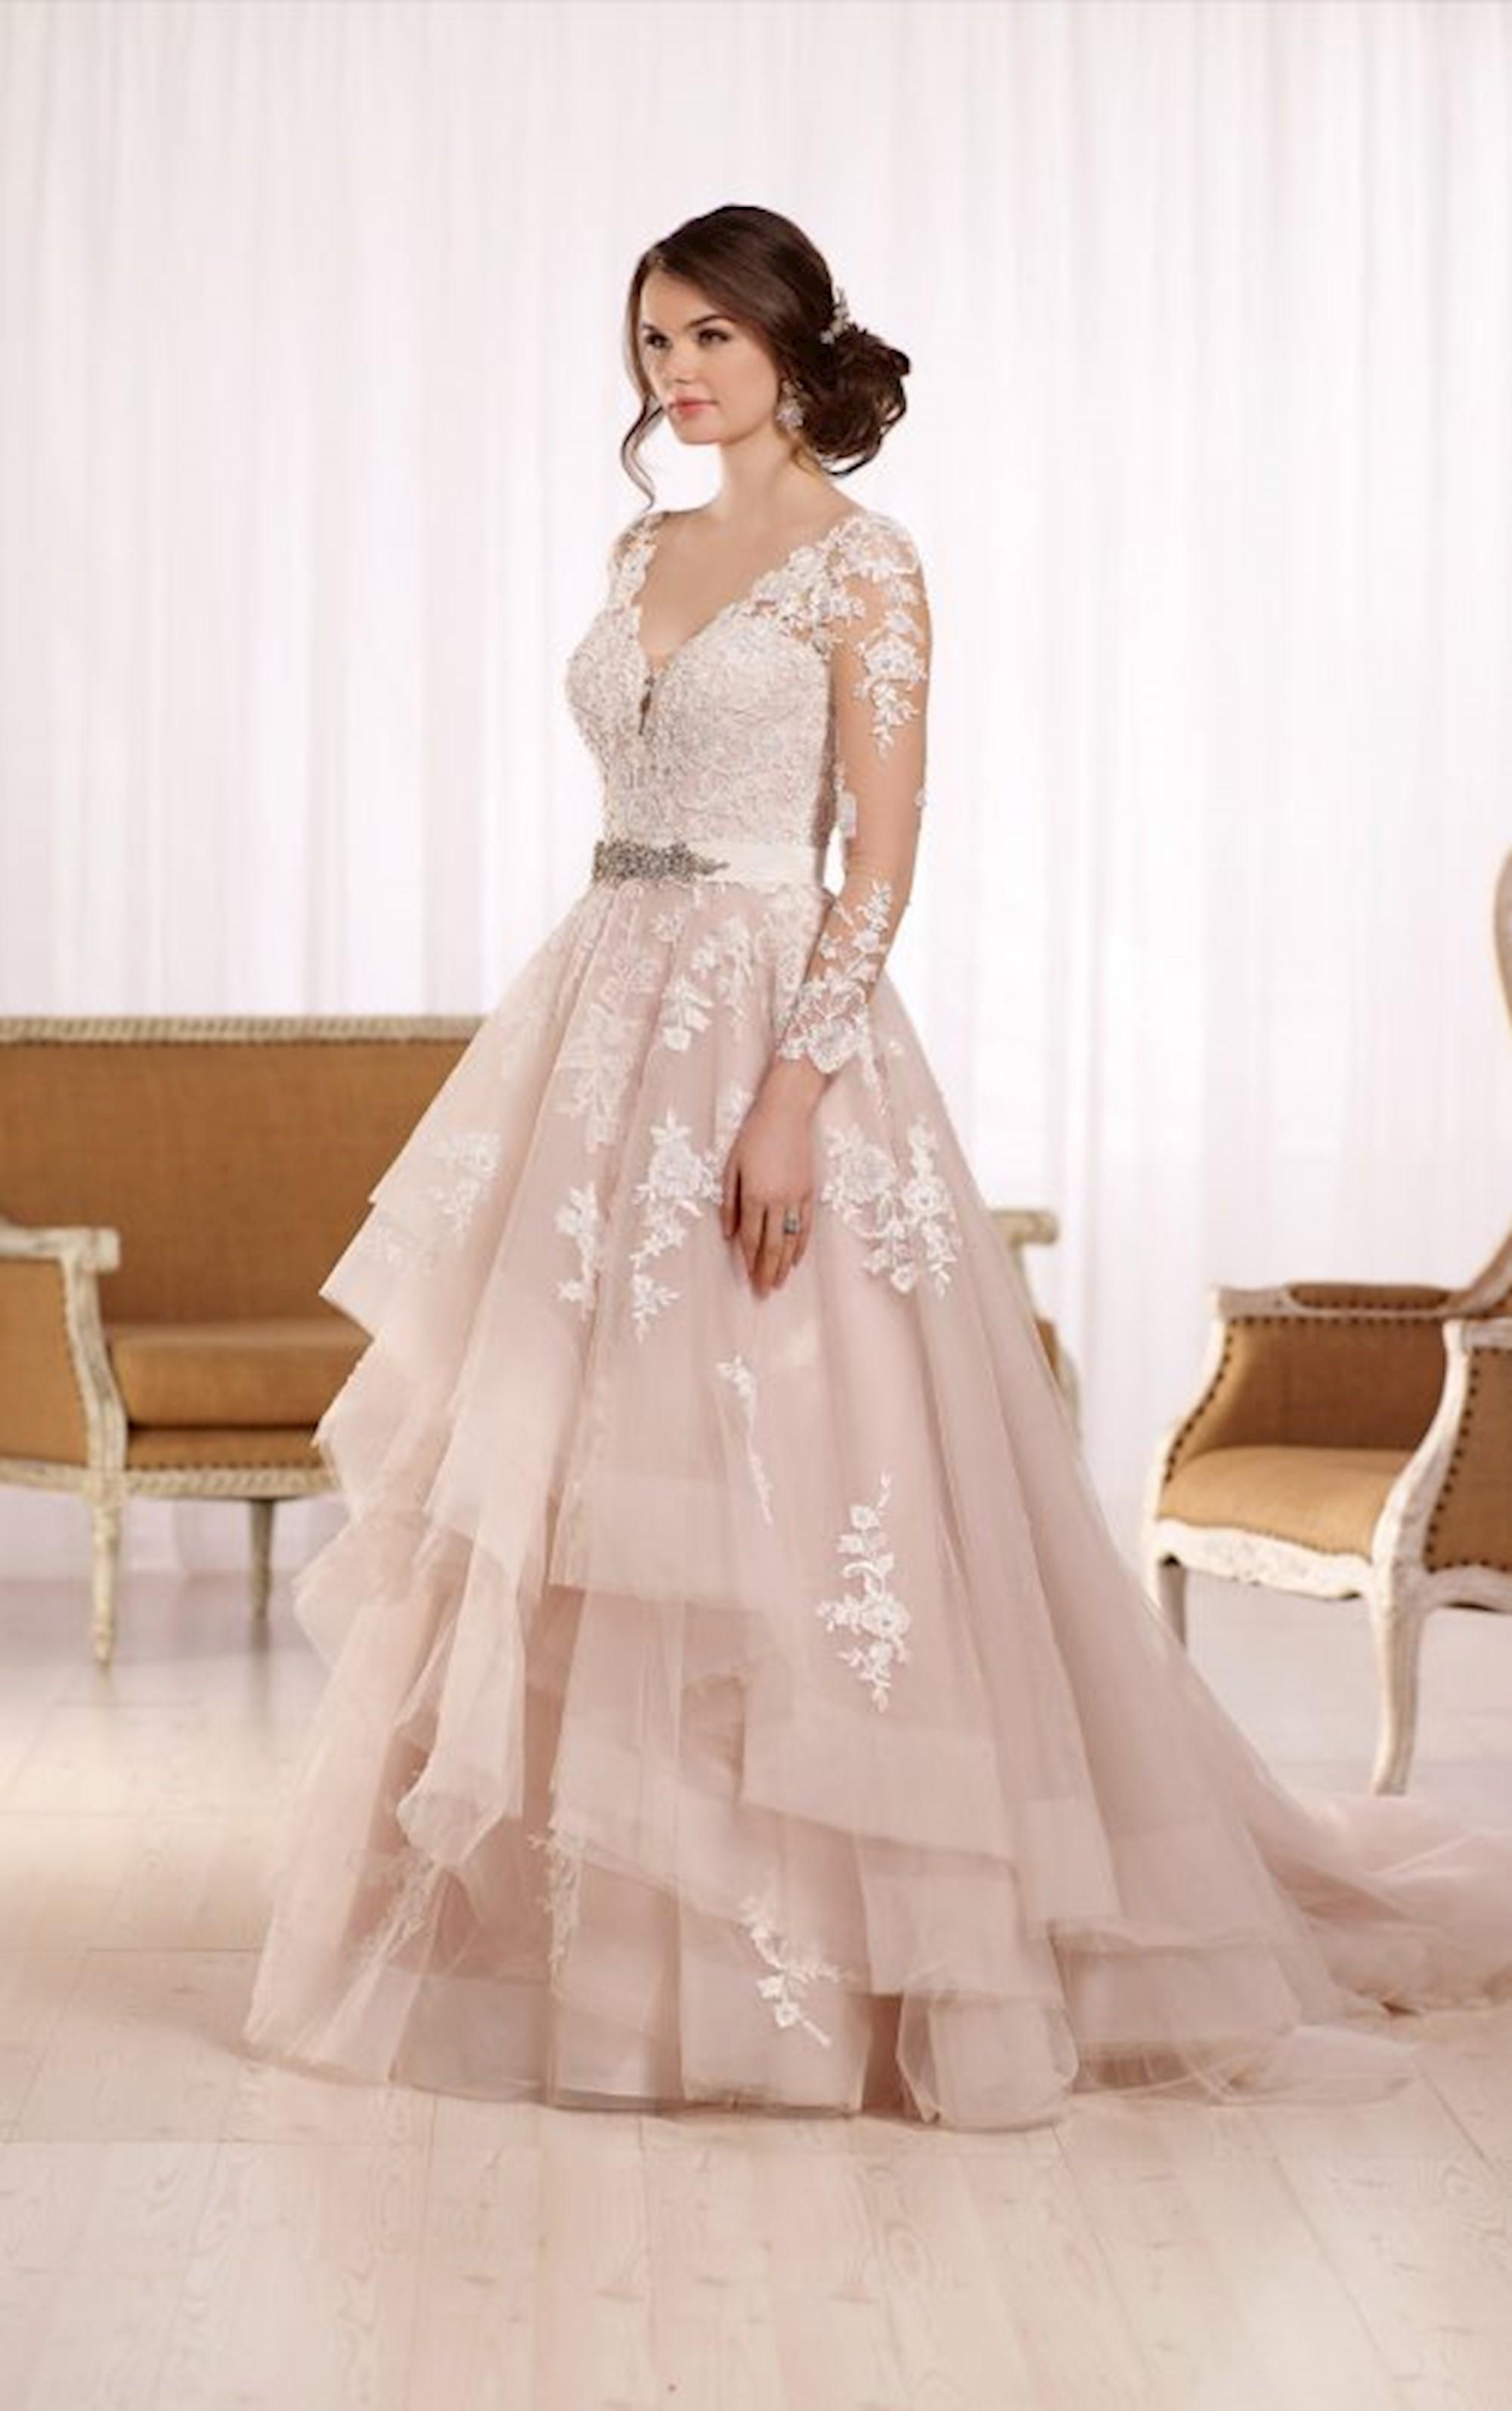 Essense of Australia Bridal Dresses | Regiss in Kentucky - D2186